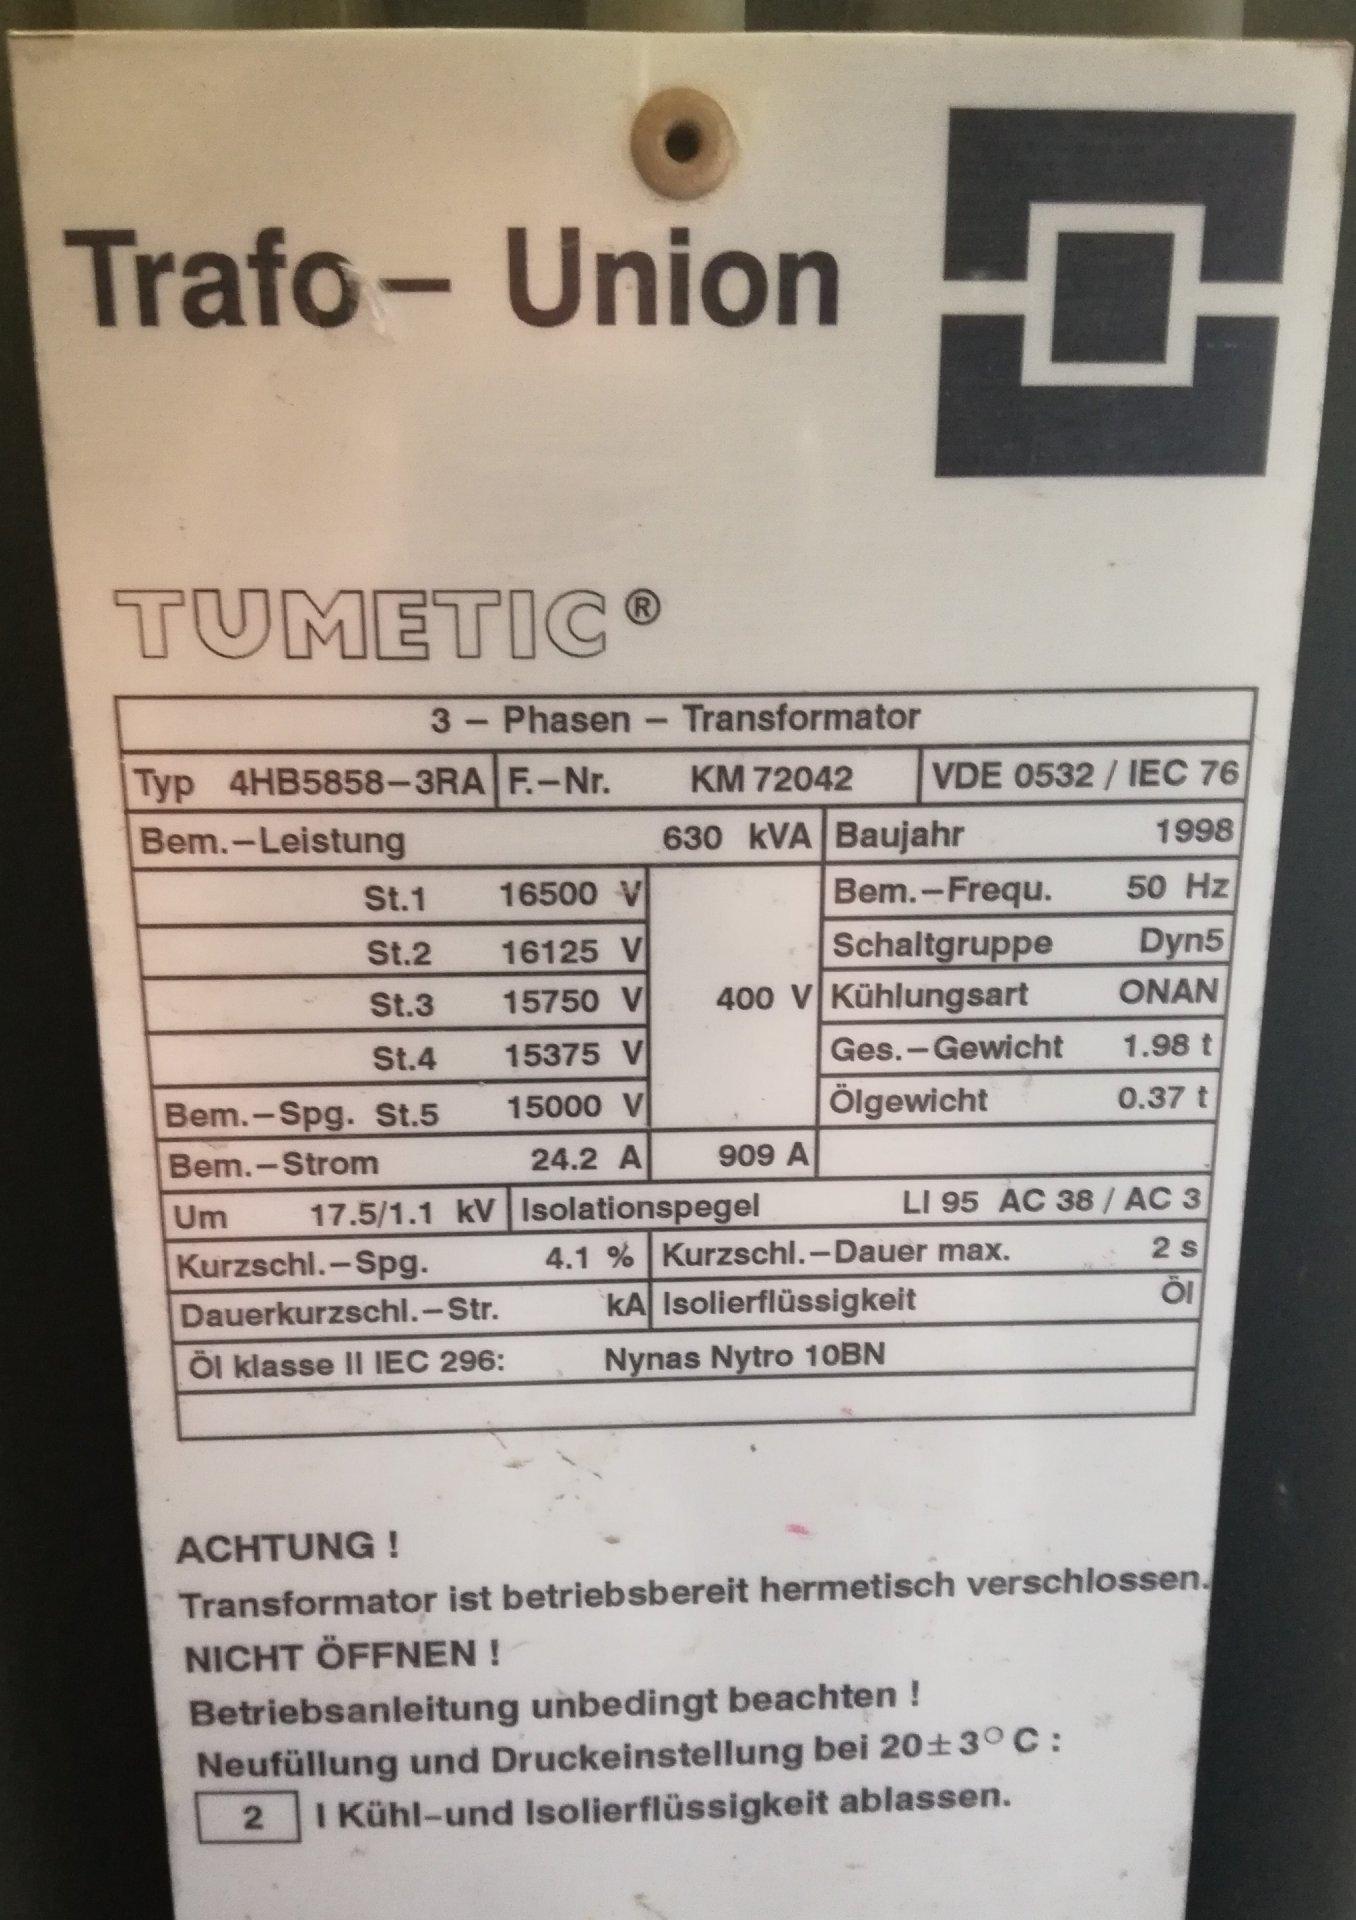 Trafo (Öl): 15 KV - 630 KVA - 400V